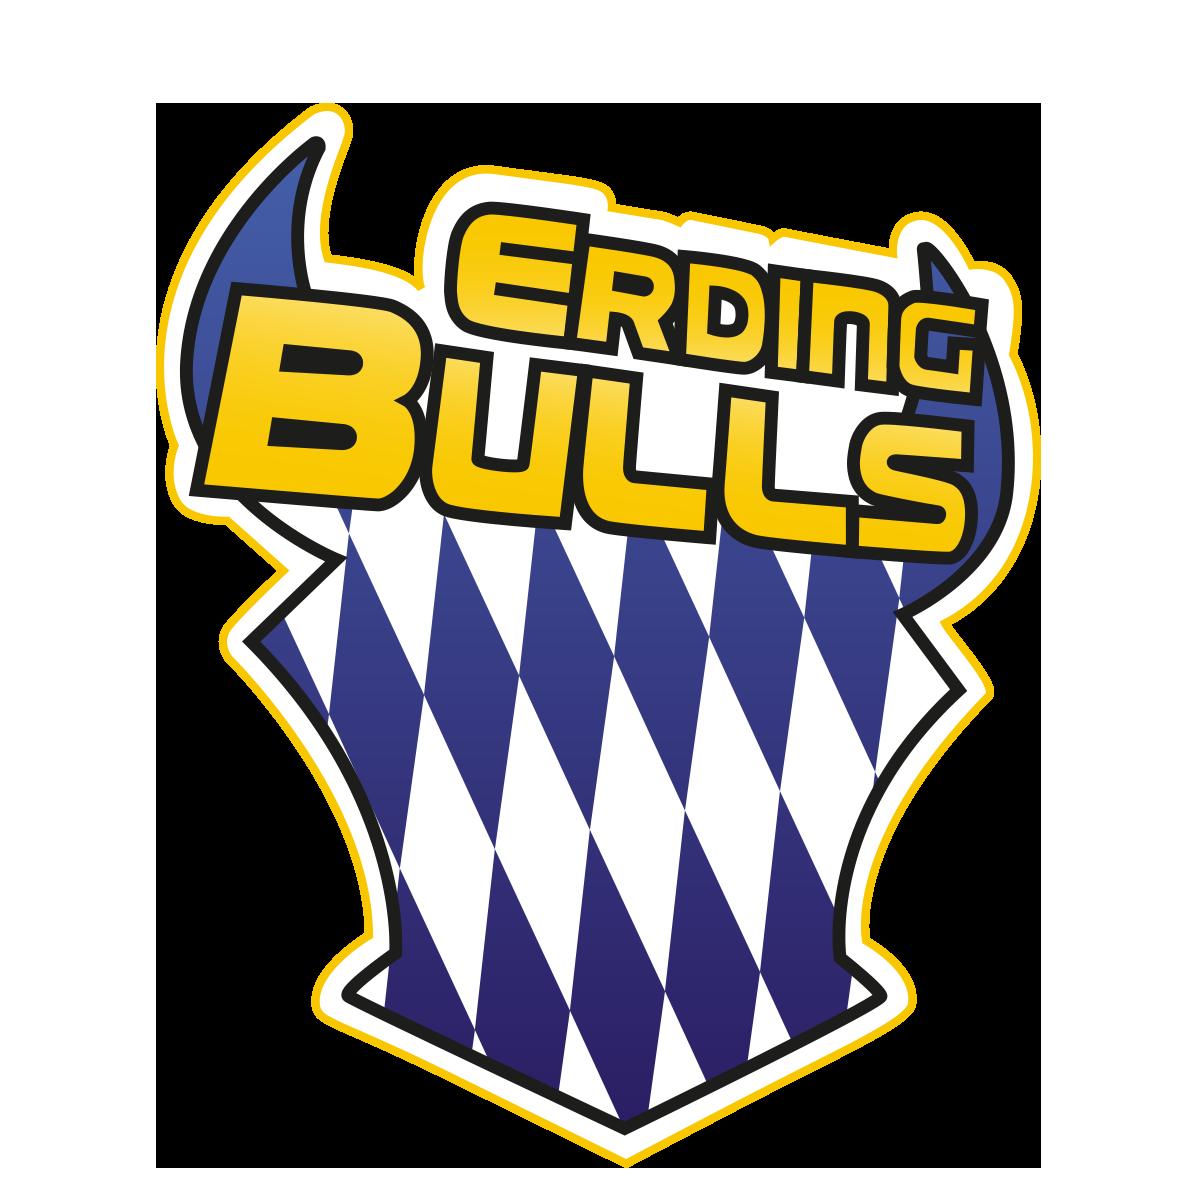 Logo Erding Bulls